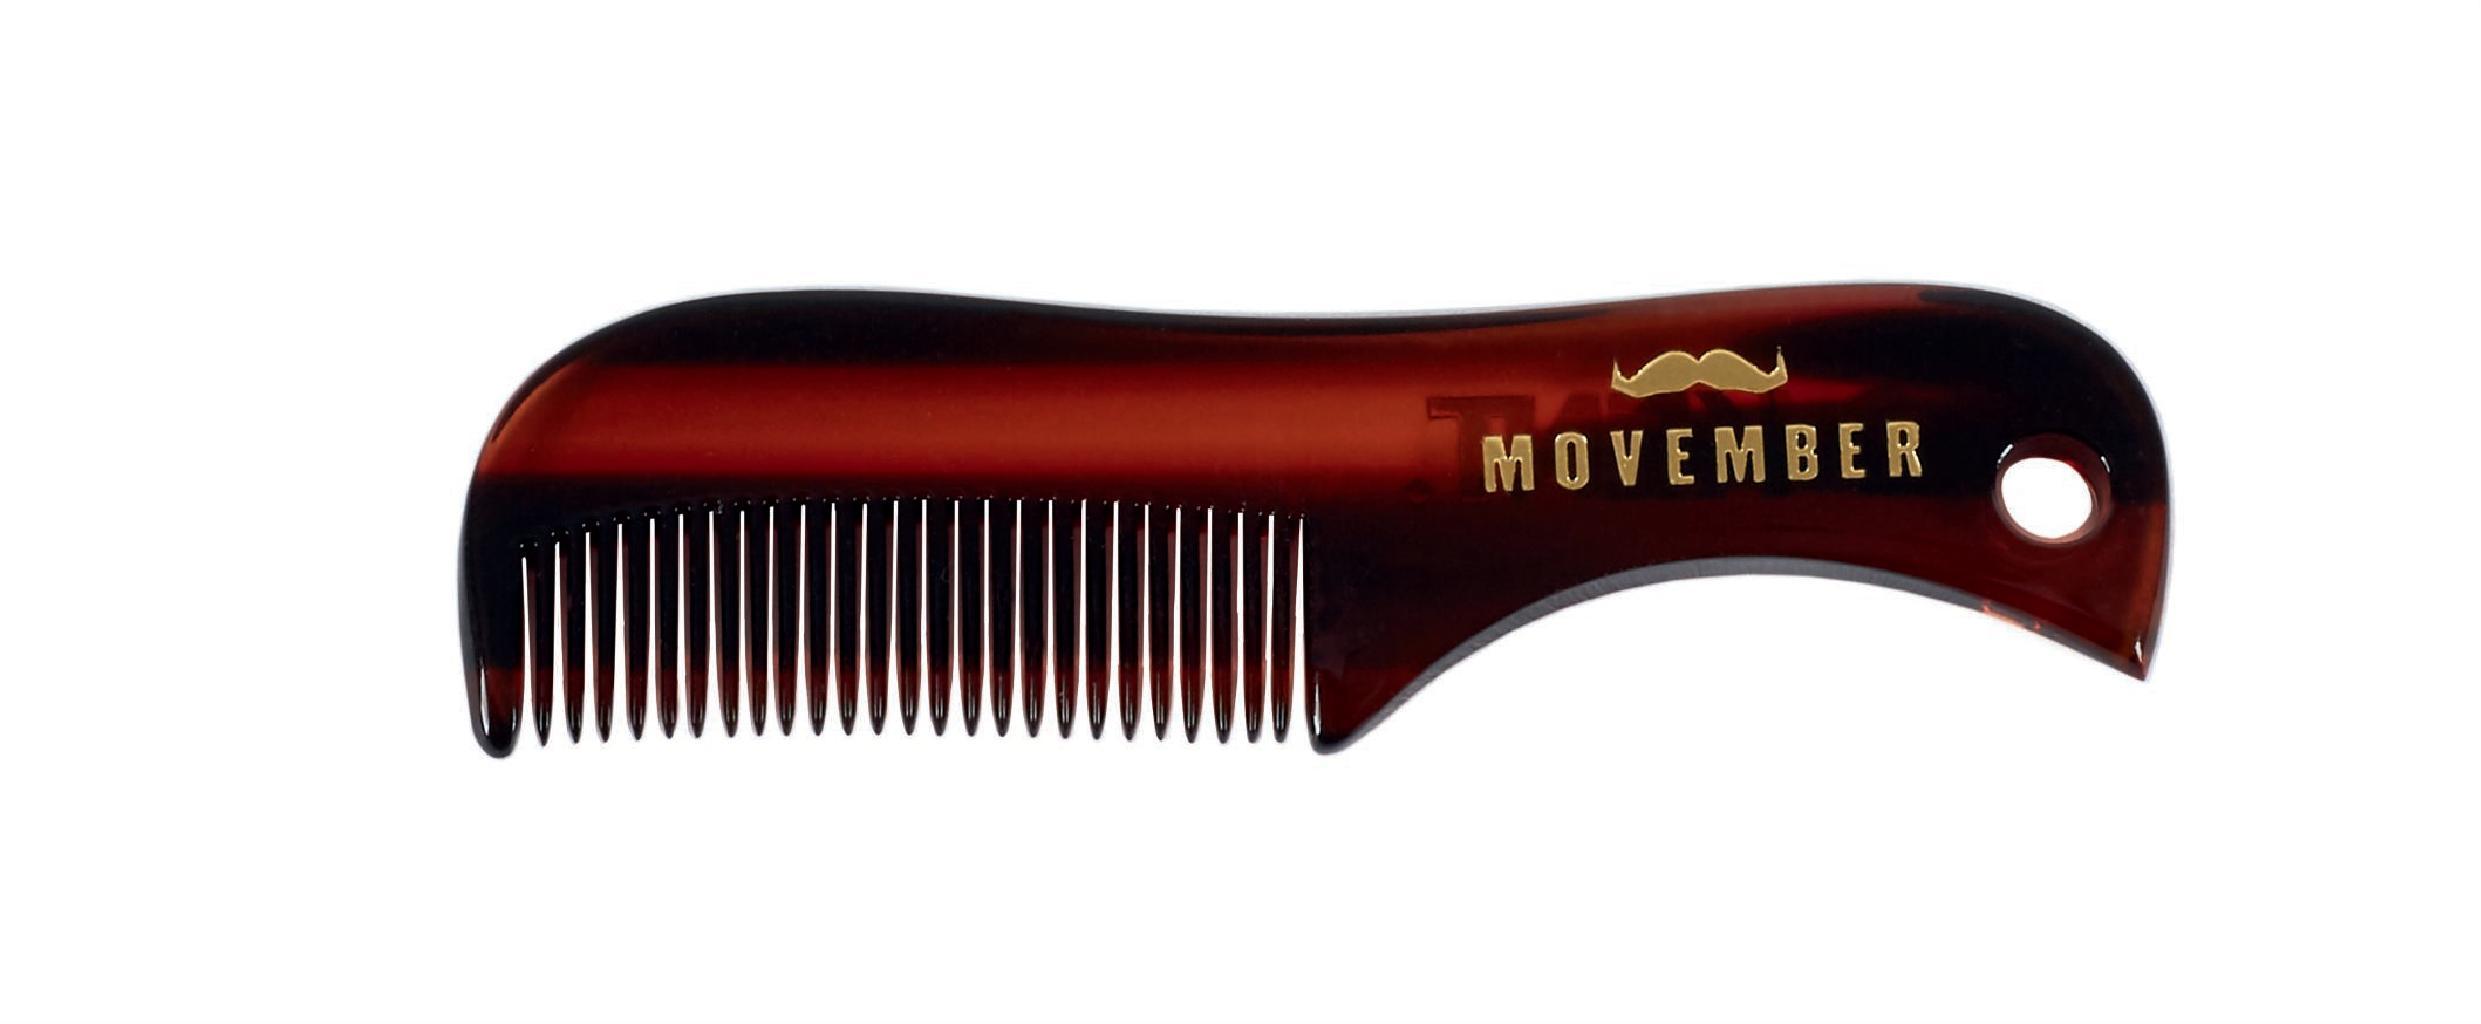 kent movember brush